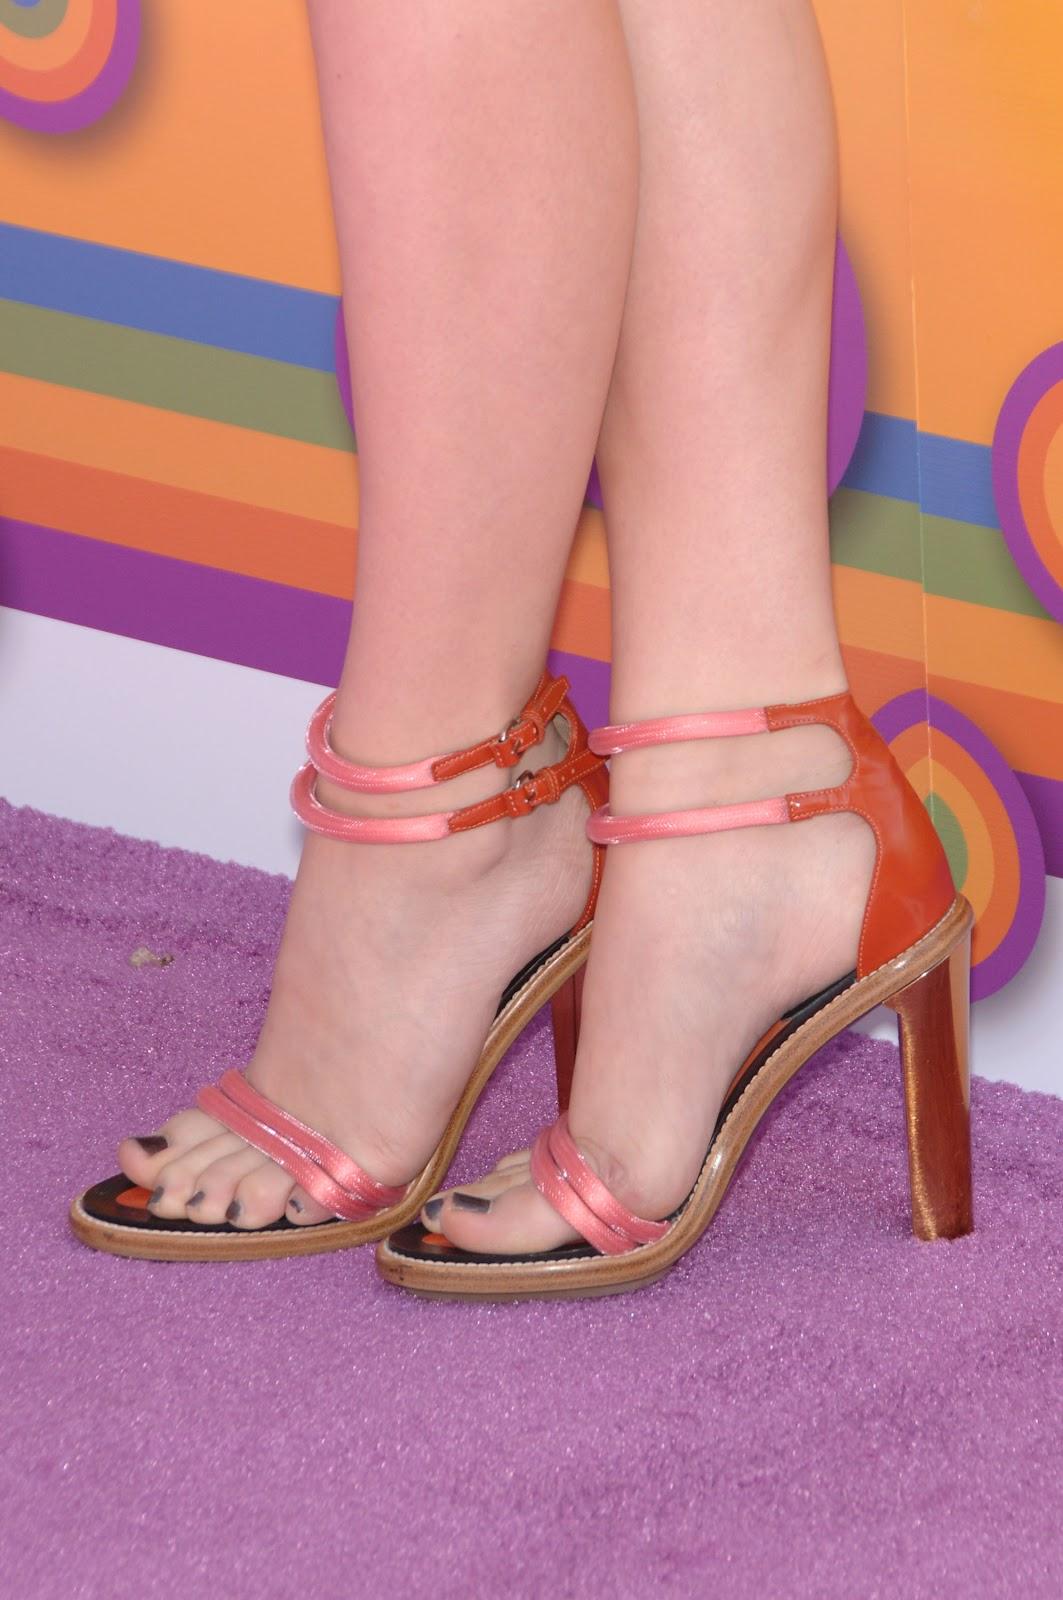 Chloe Grace Moretz - F...